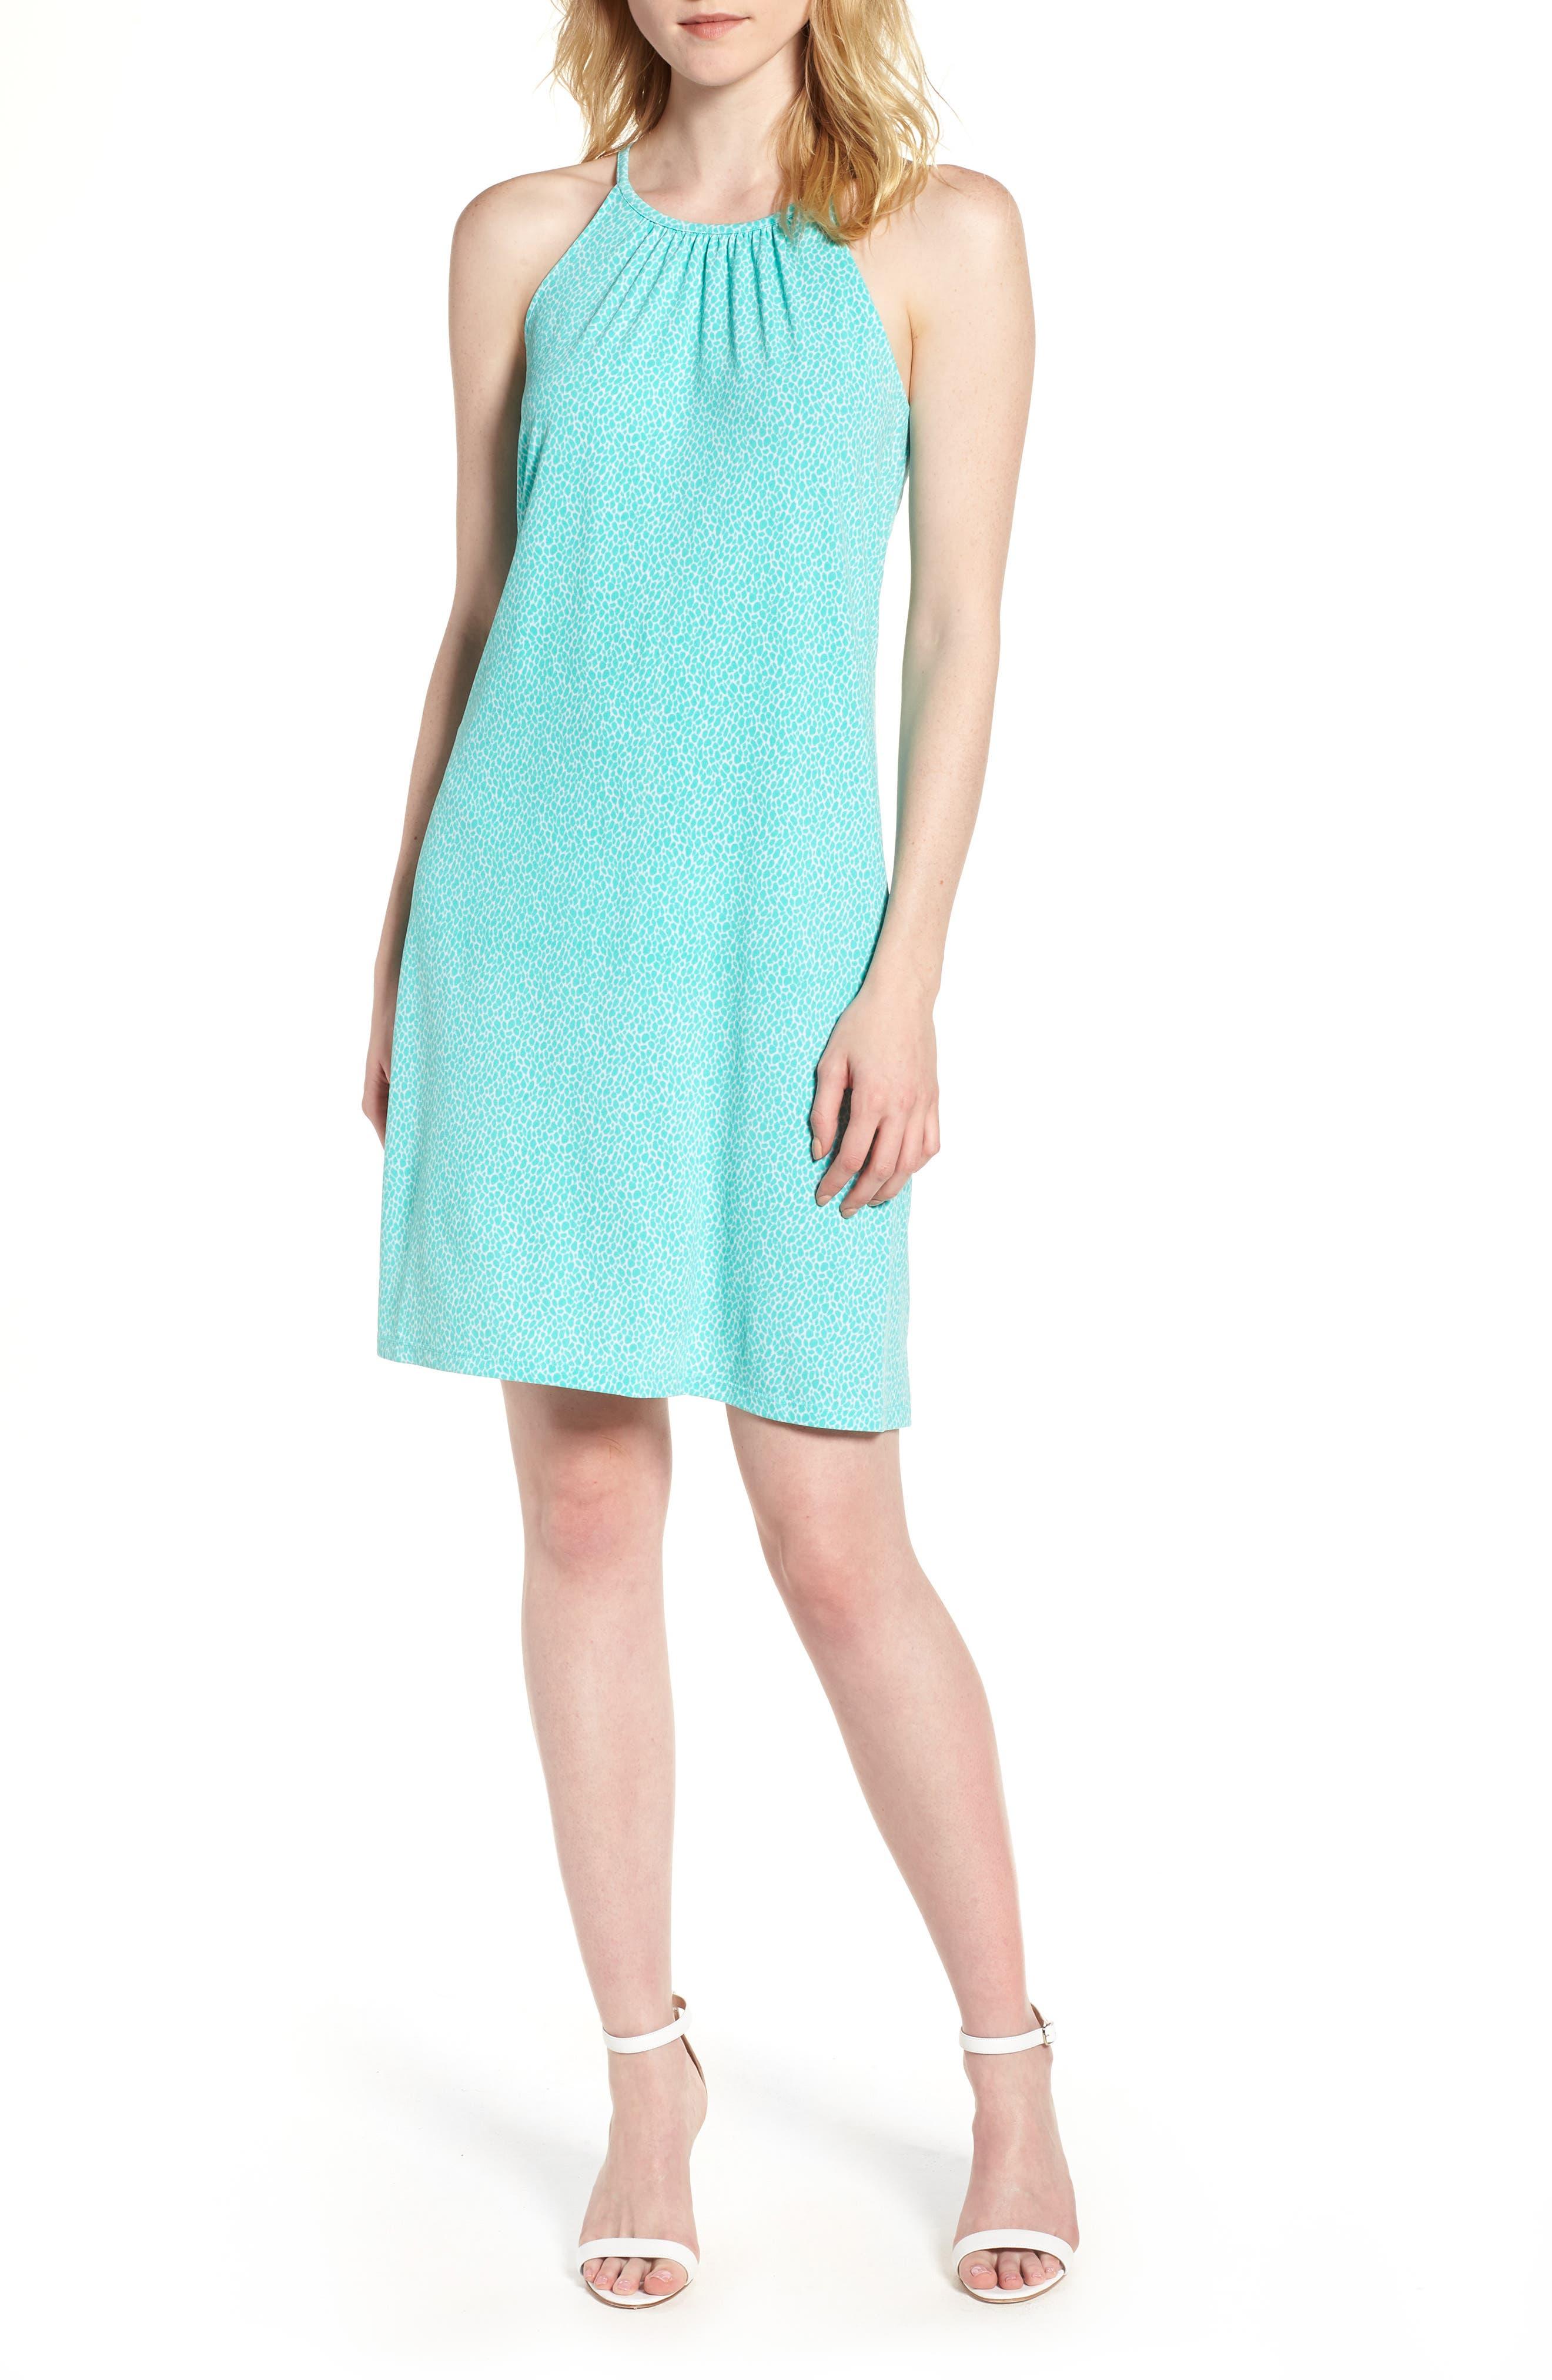 Leo Halter Top Mini Dress,                         Main,                         color, 199